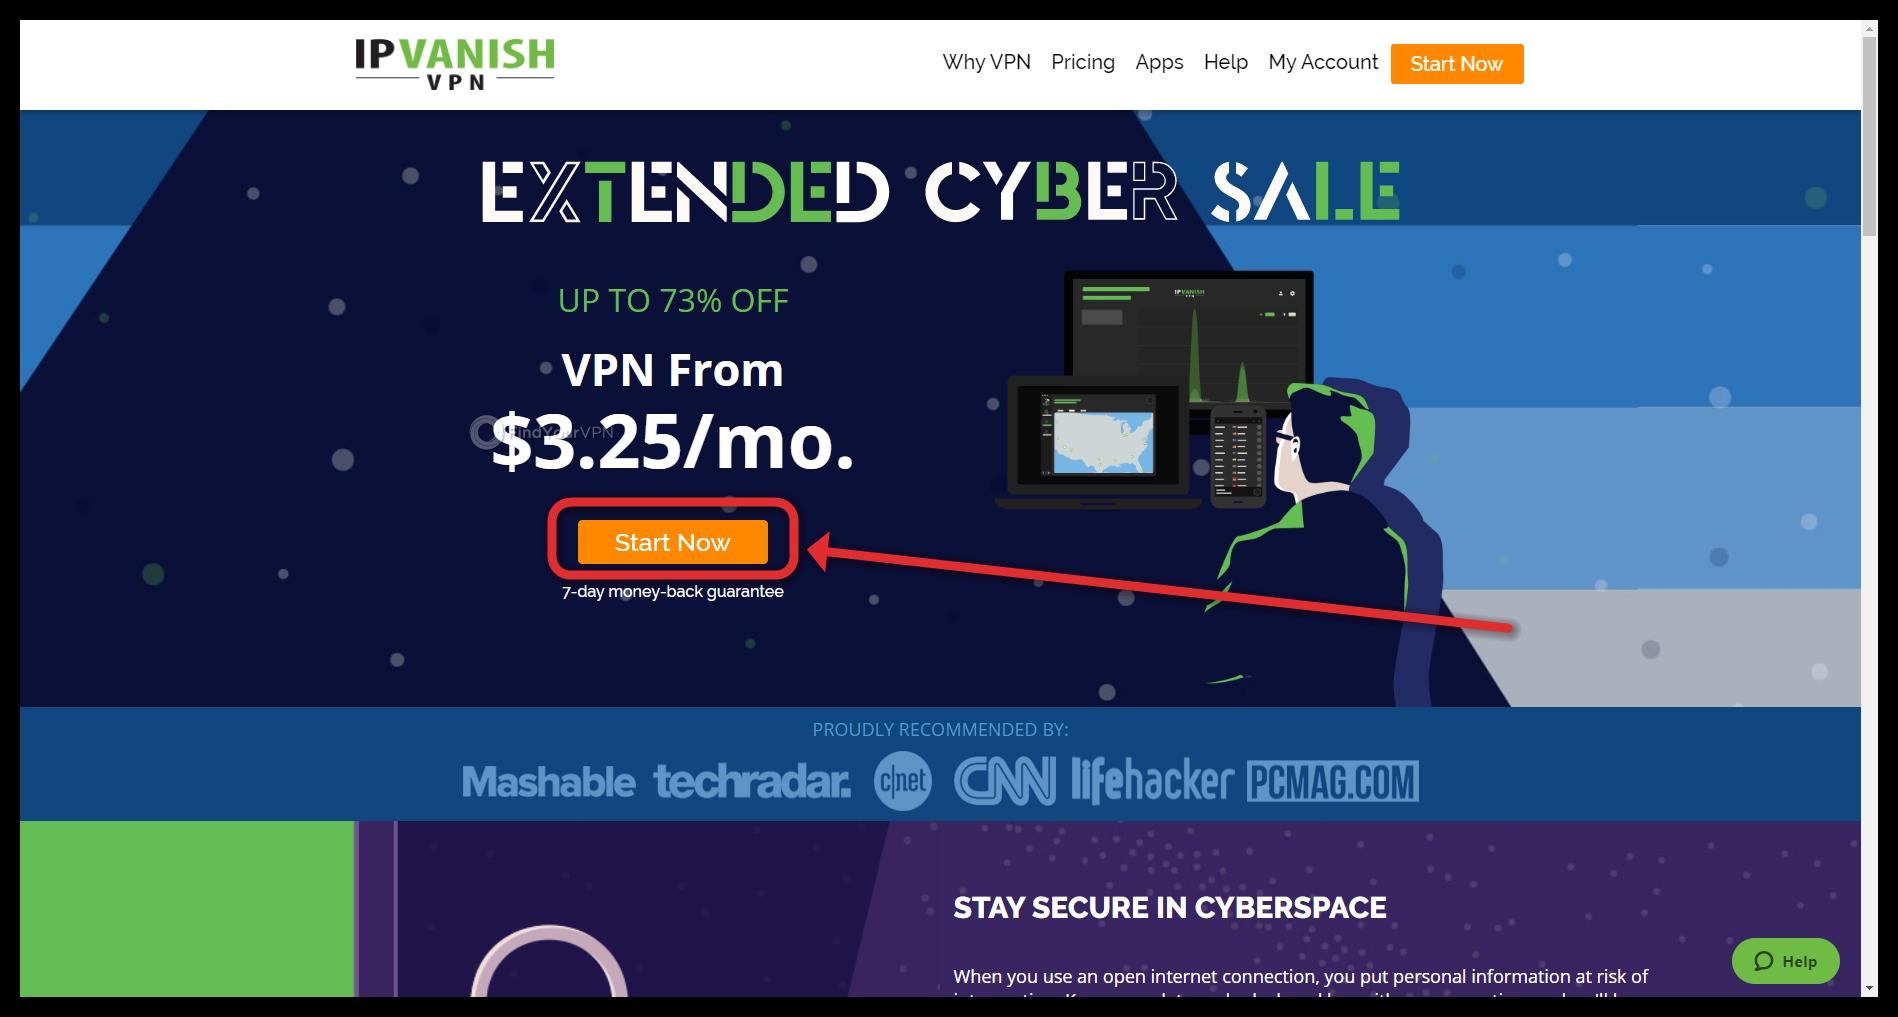 IPVanish's landing page